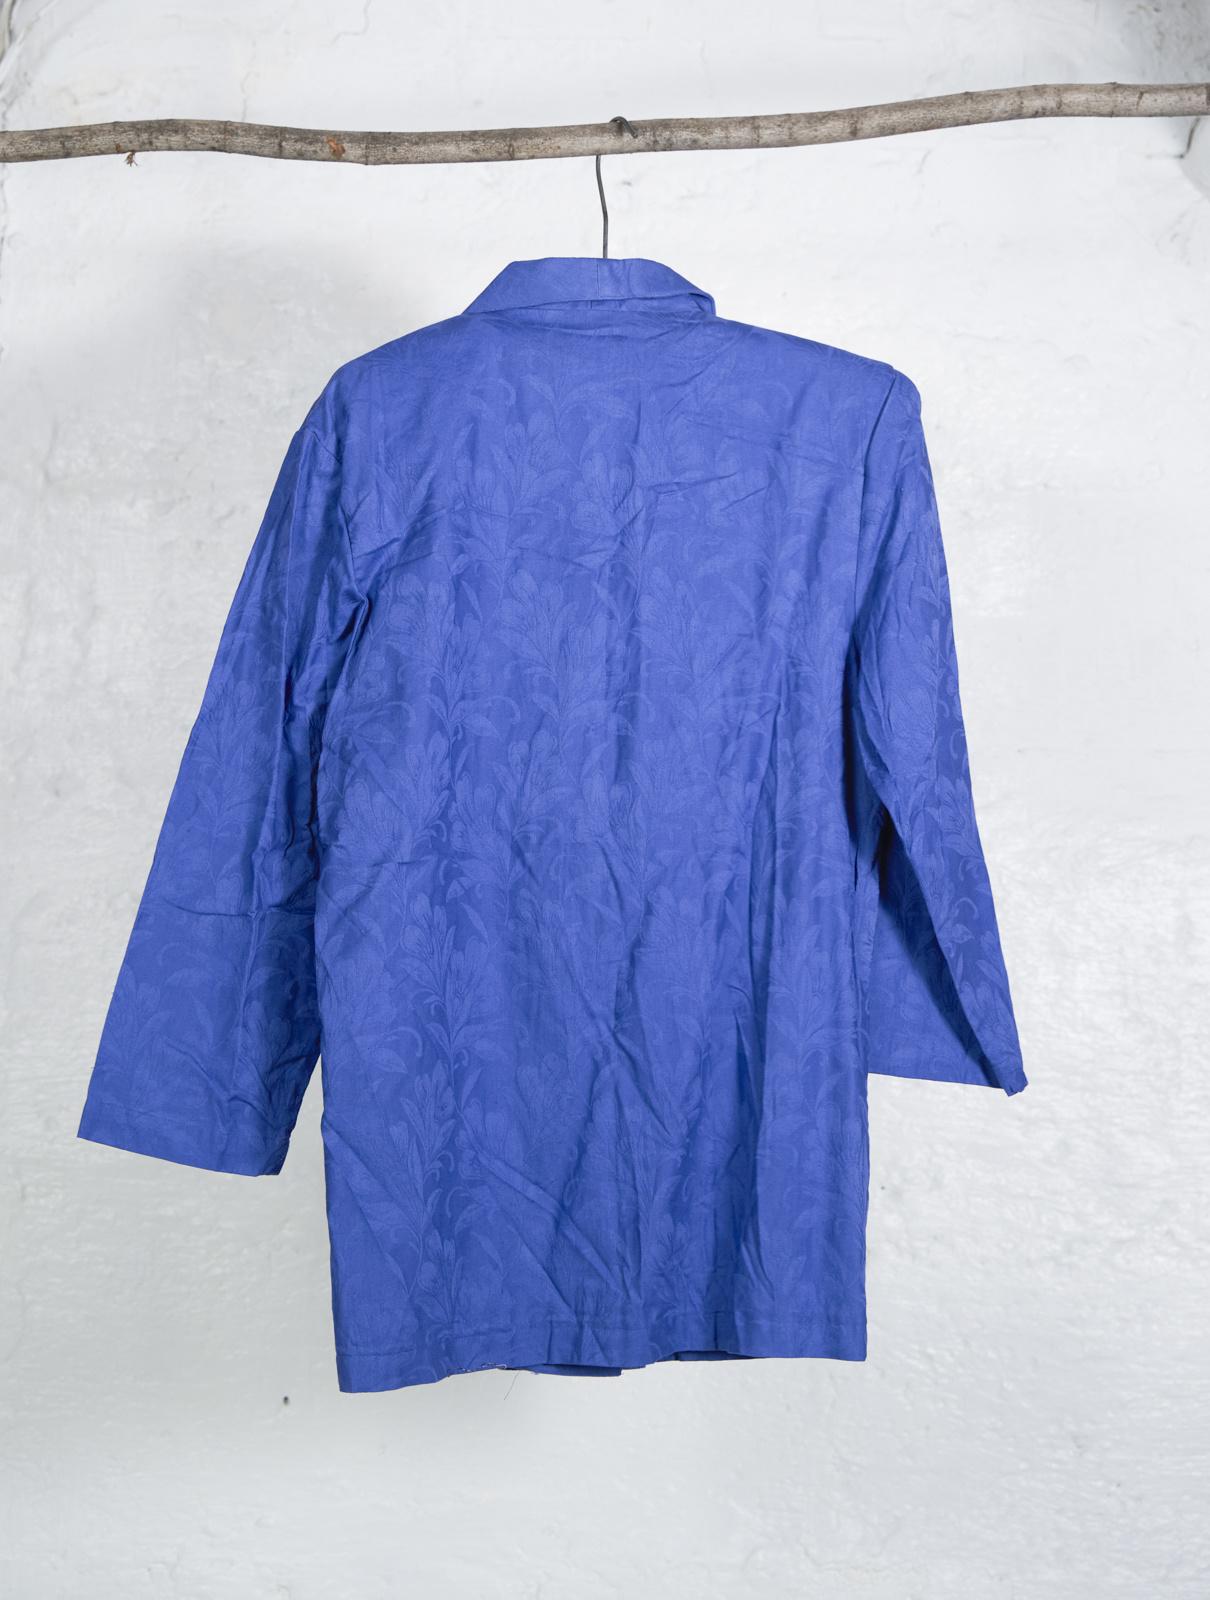 Blazer bleu clair fleur ton sur ton